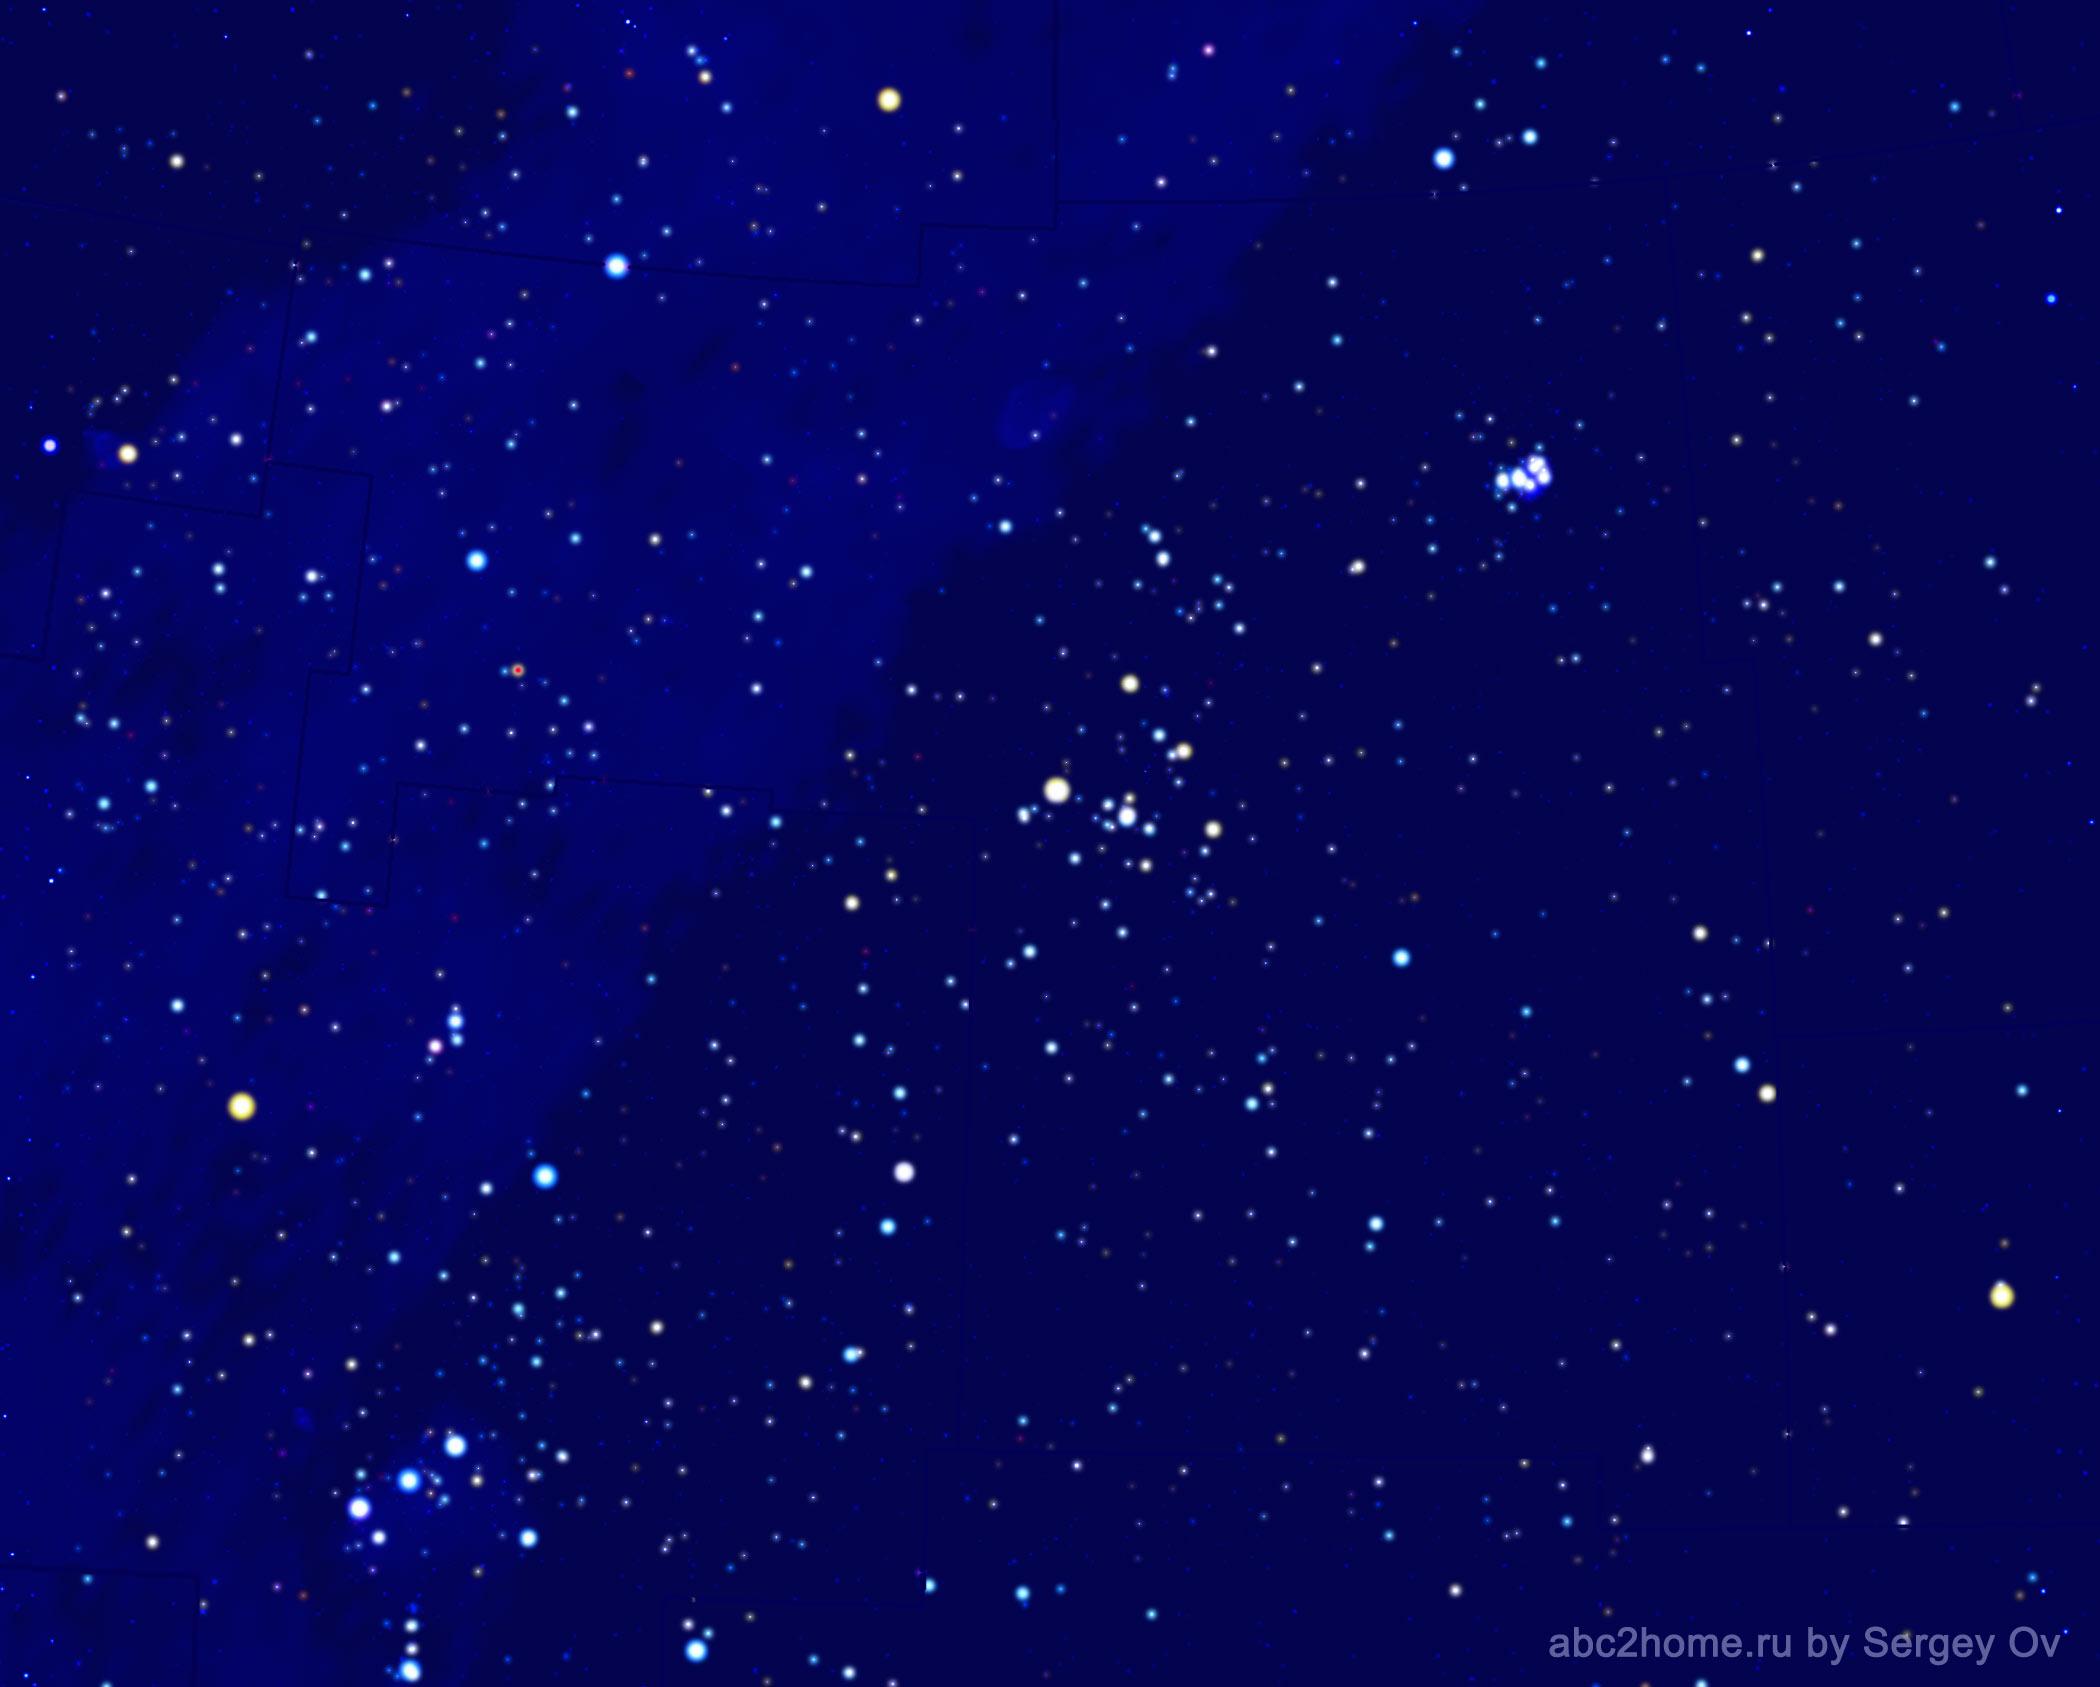 Созвездие Телец, звезды созвездия Тельца, рис. 2.1.Tau